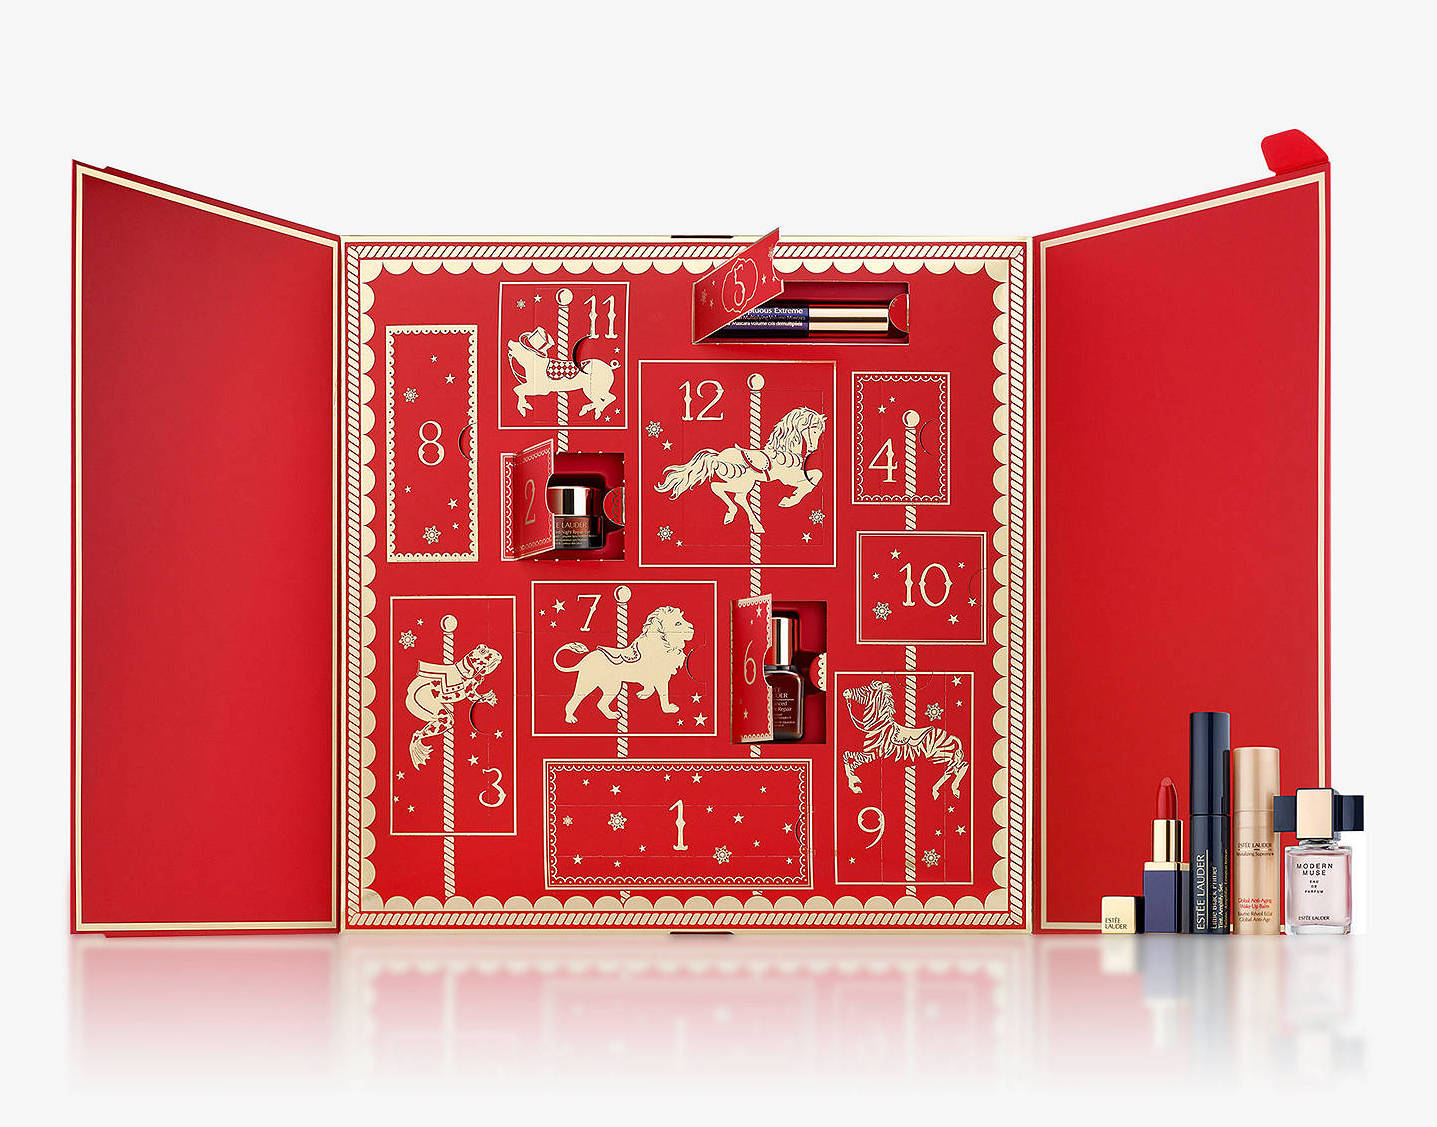 estee-lauder-holiday-12-day-advent-calendar-2018.jpeg